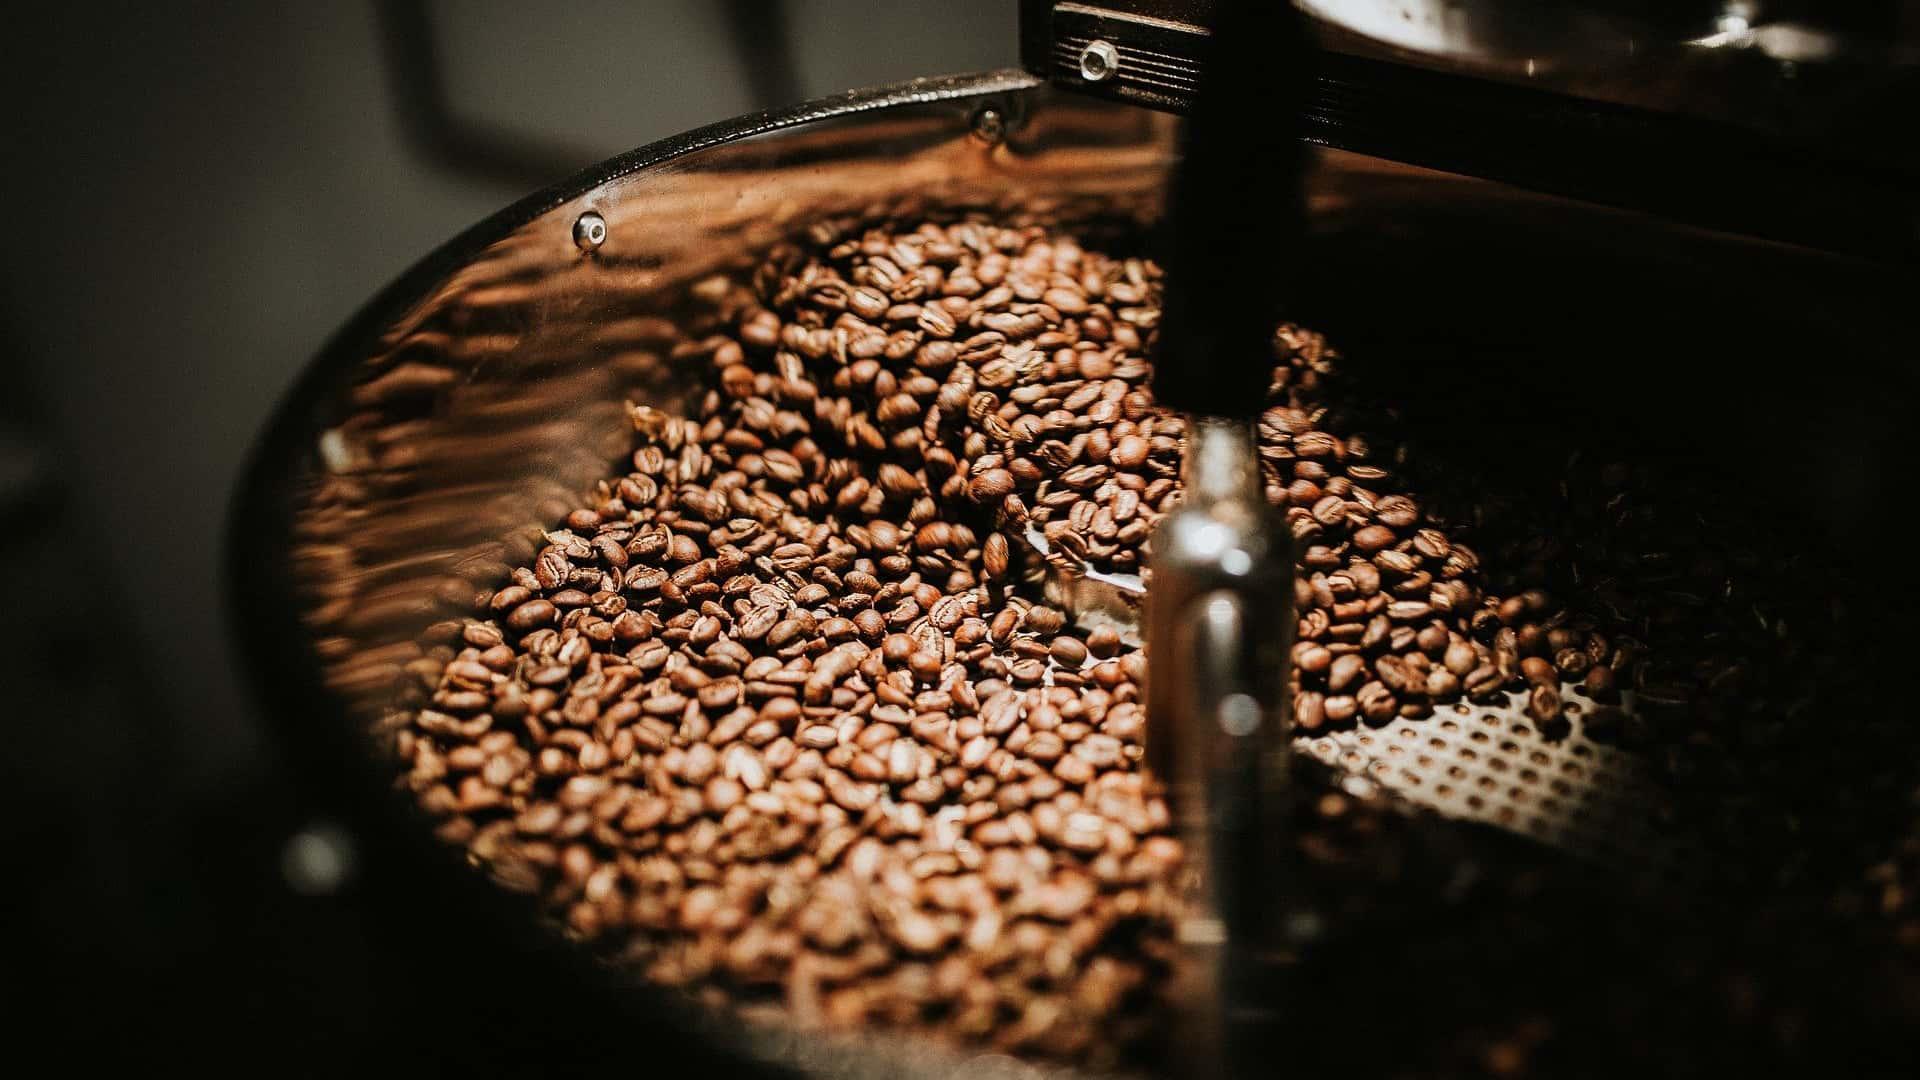 Kaffee Henri Straßburg